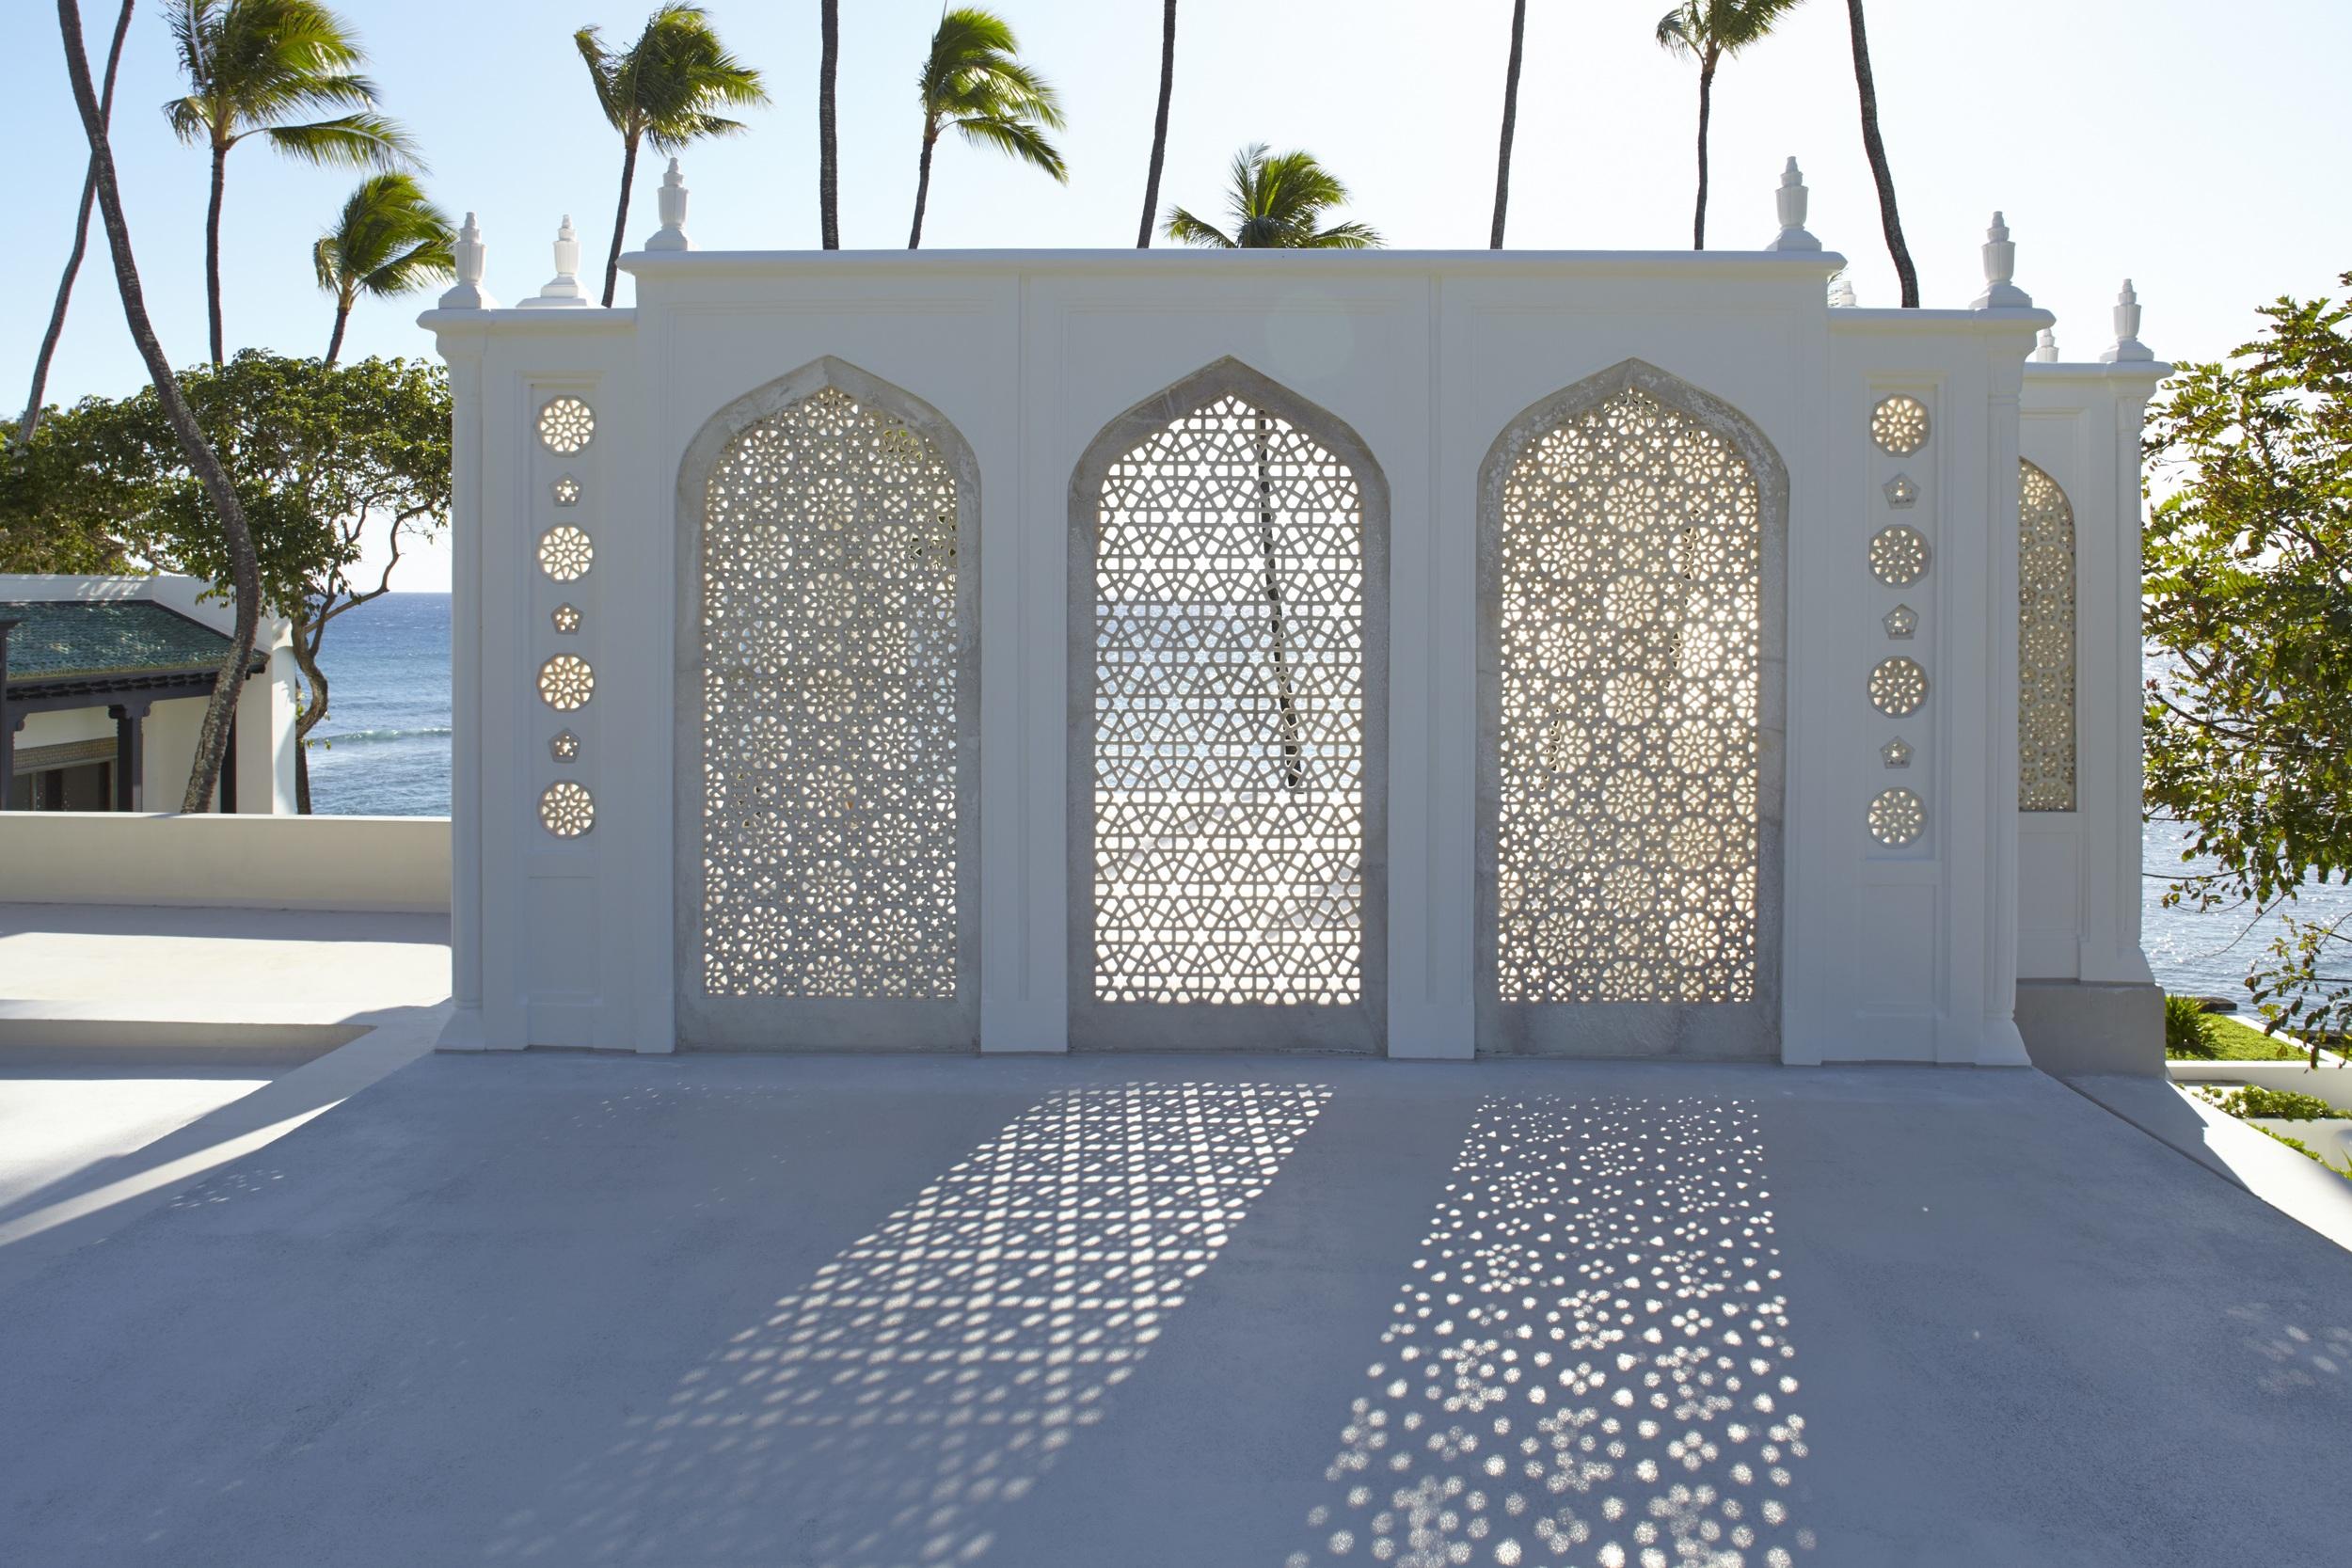 Jali Pavillion at Shangri La.     © 2014, Linny Morris, courtesy of the Doris Duke Foundation for Islamic Art, Honolulu, Hawai'i.